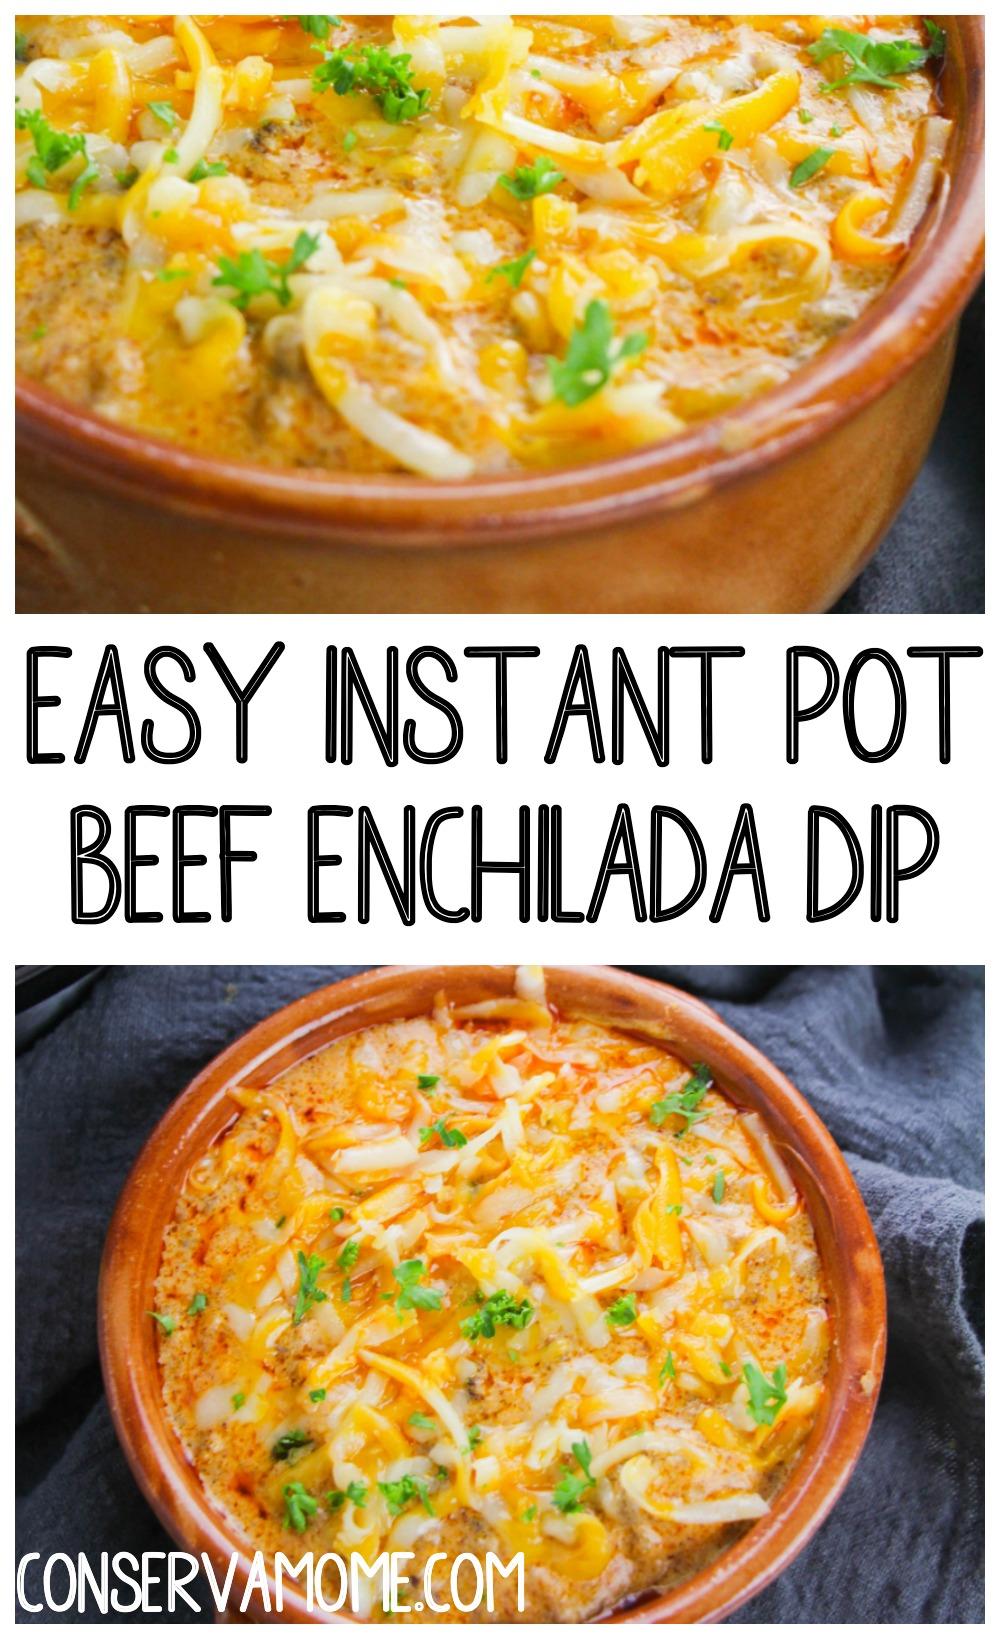 Easy Instant Pot Beef Enchilada Dip Recipe